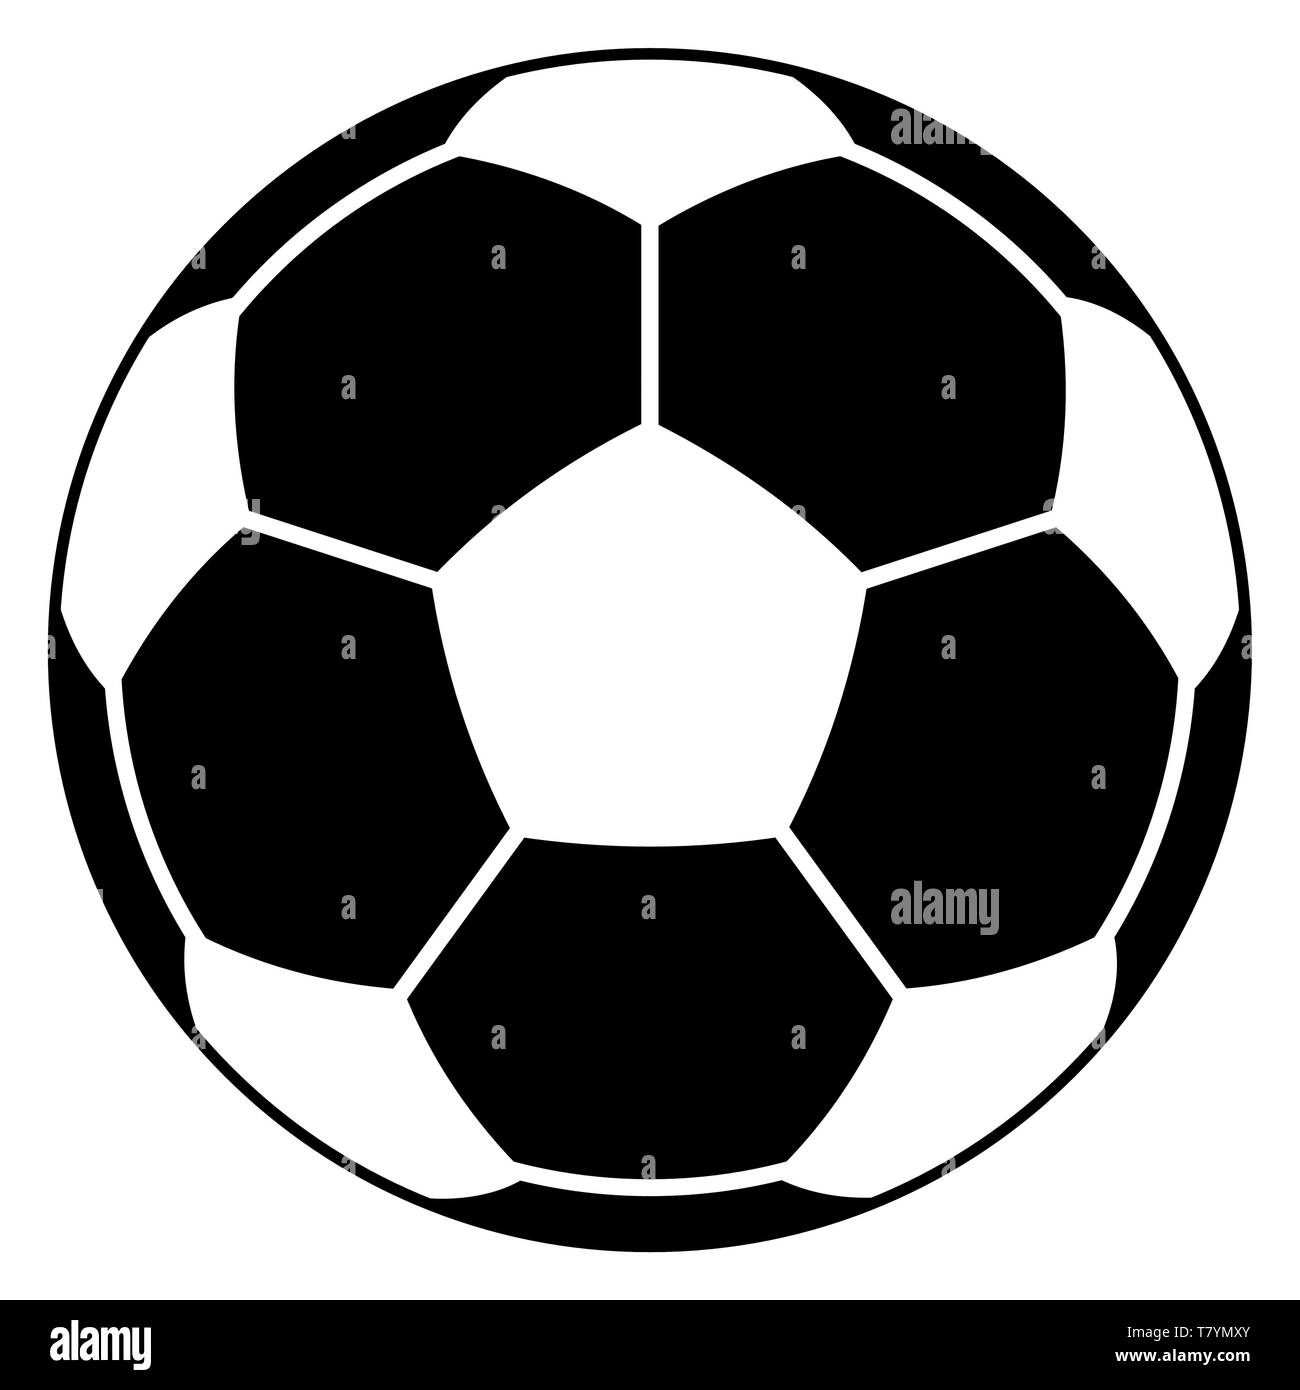 Abbildung Die Fussball Symbol Vektor Abbildung Bild